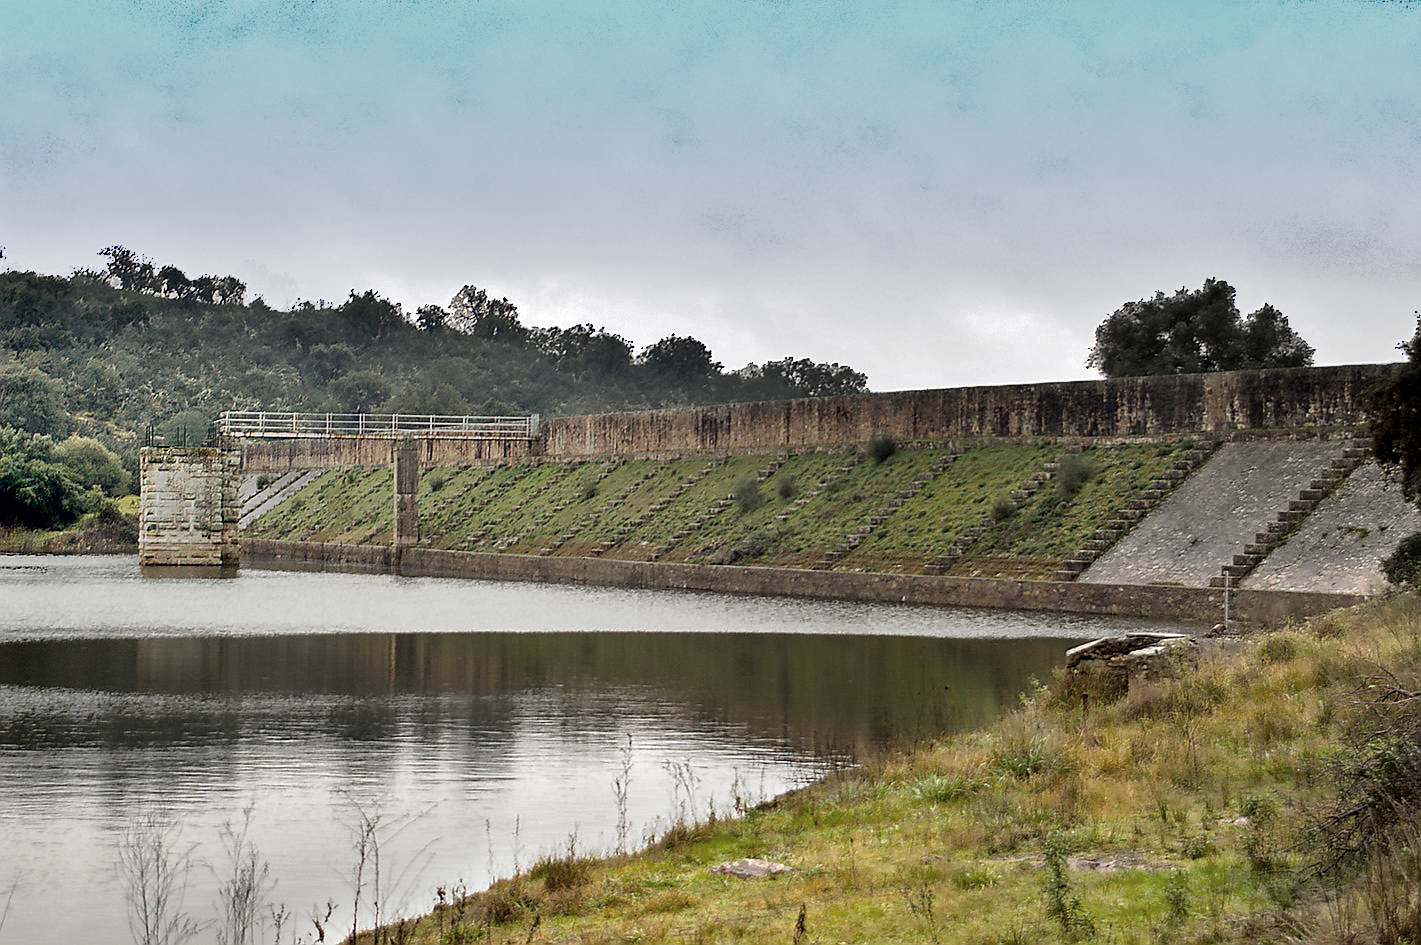 Dams are major driver of global environmental change